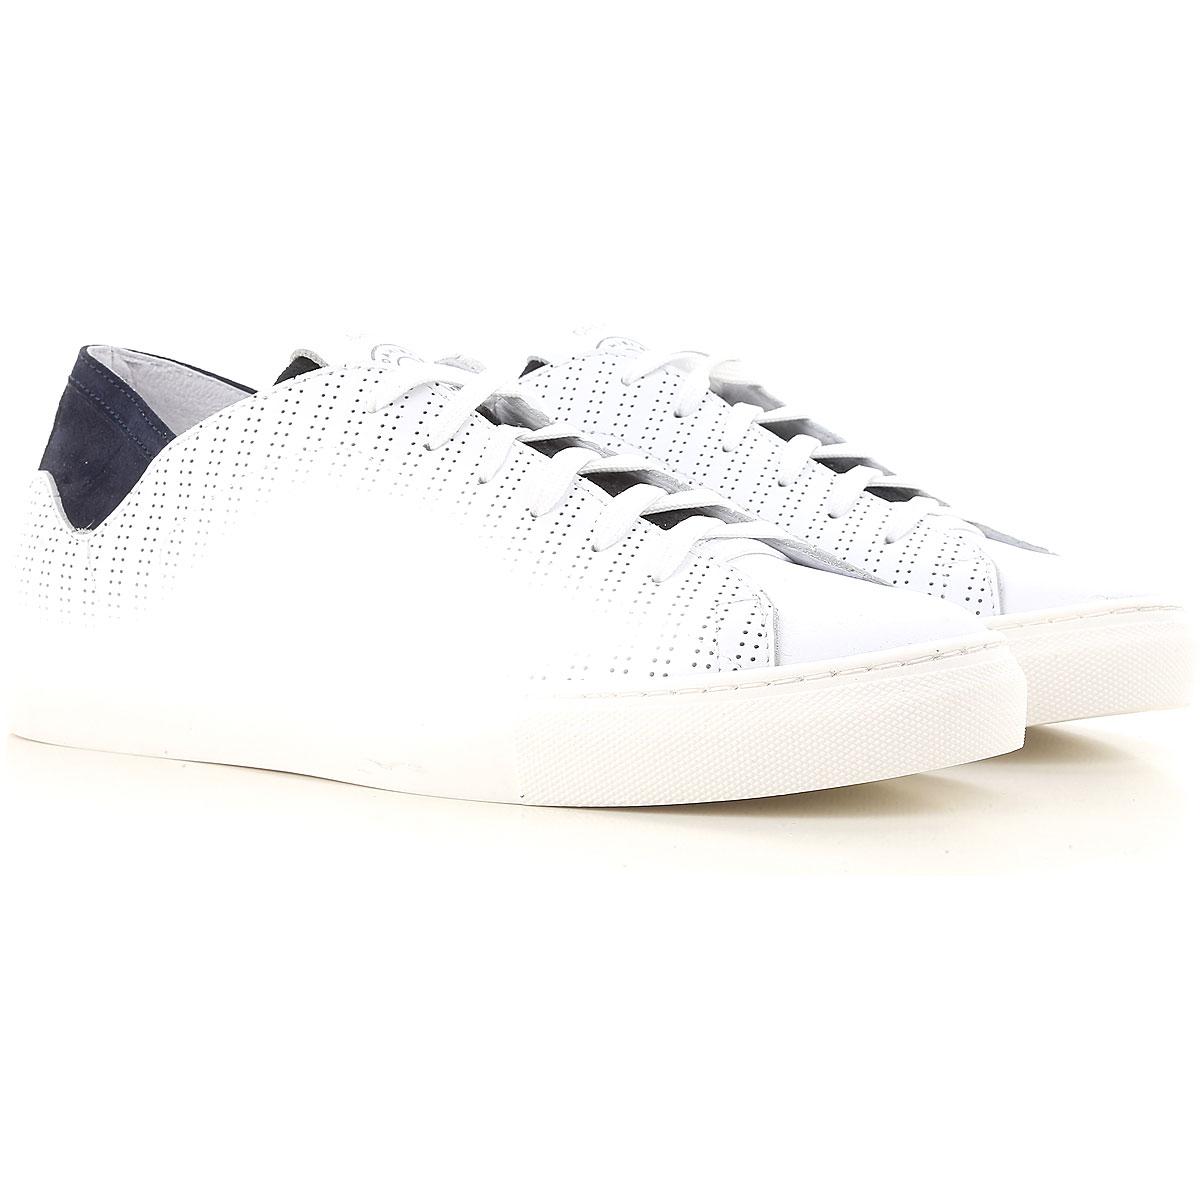 07d9539a4b Mens Shoes Daniele Alessandrini, Style code: f7202kl4953800-203-